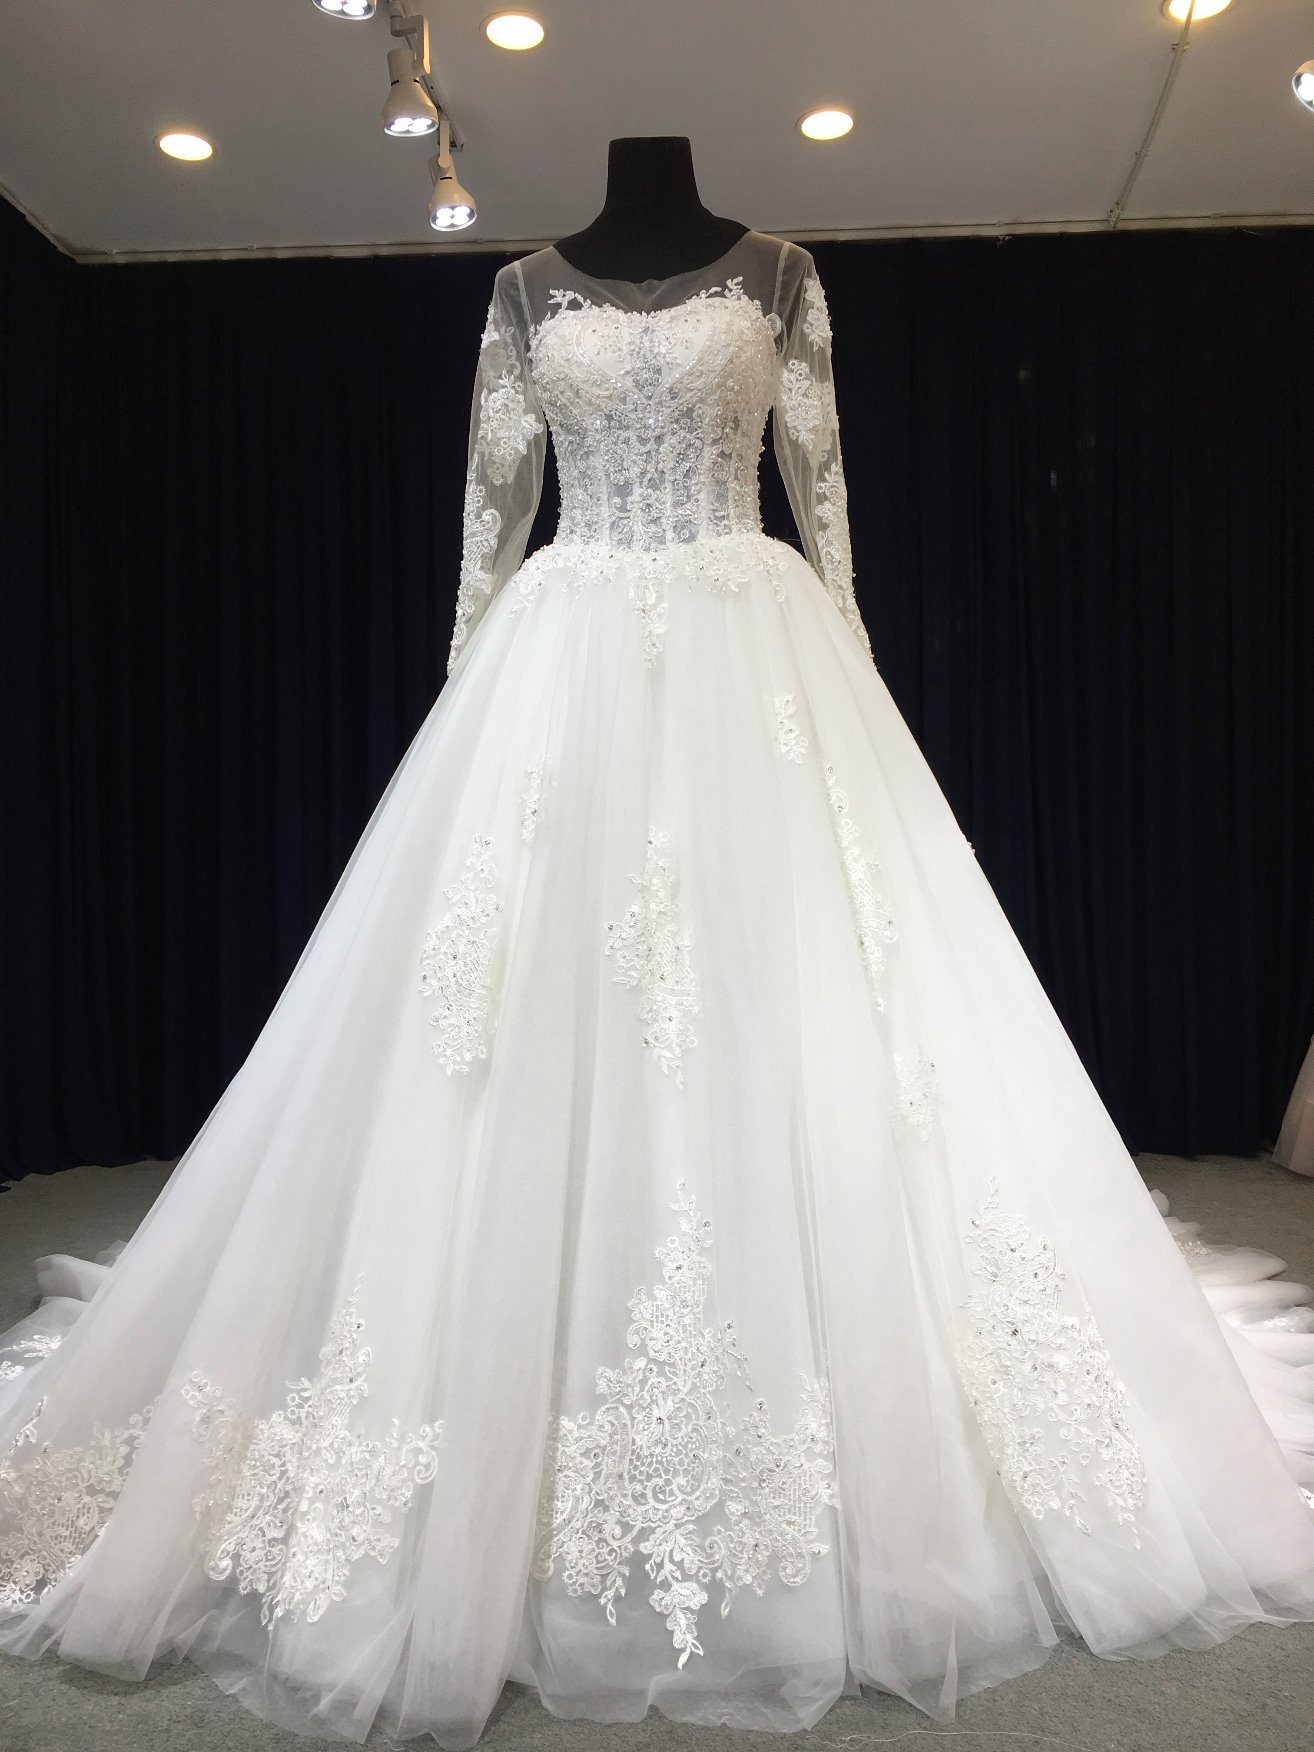 China Aoliweiya Soft Tulle Sheer Bodice Full Sleeve Wedding Gown ...